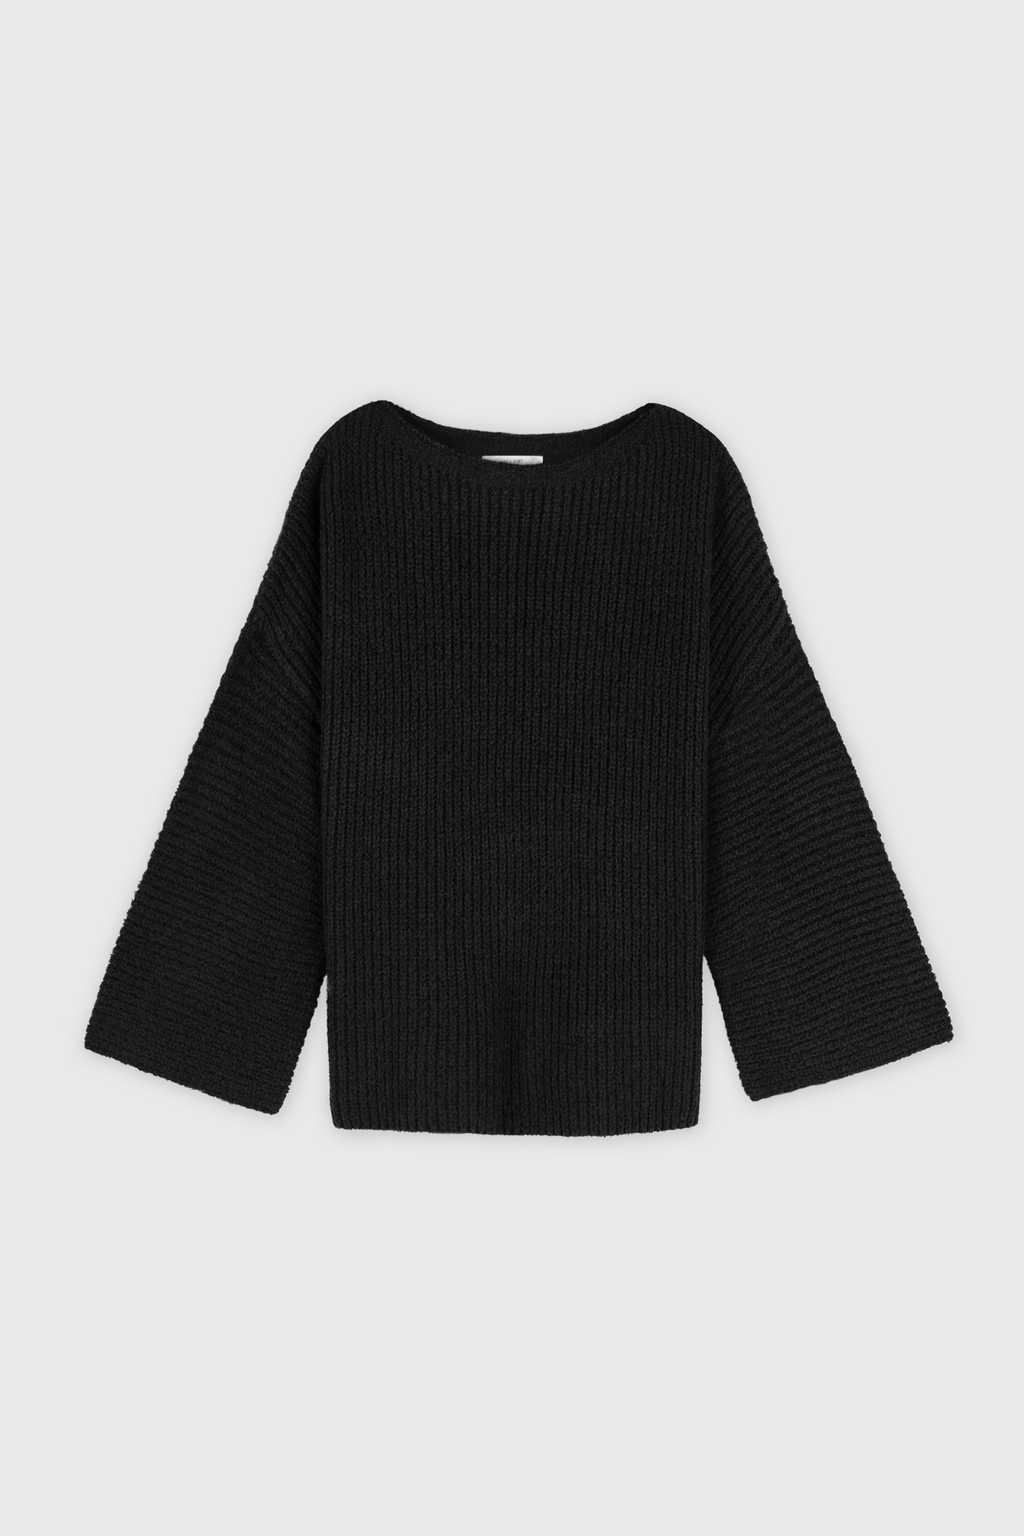 Sweater 2318 Black 10